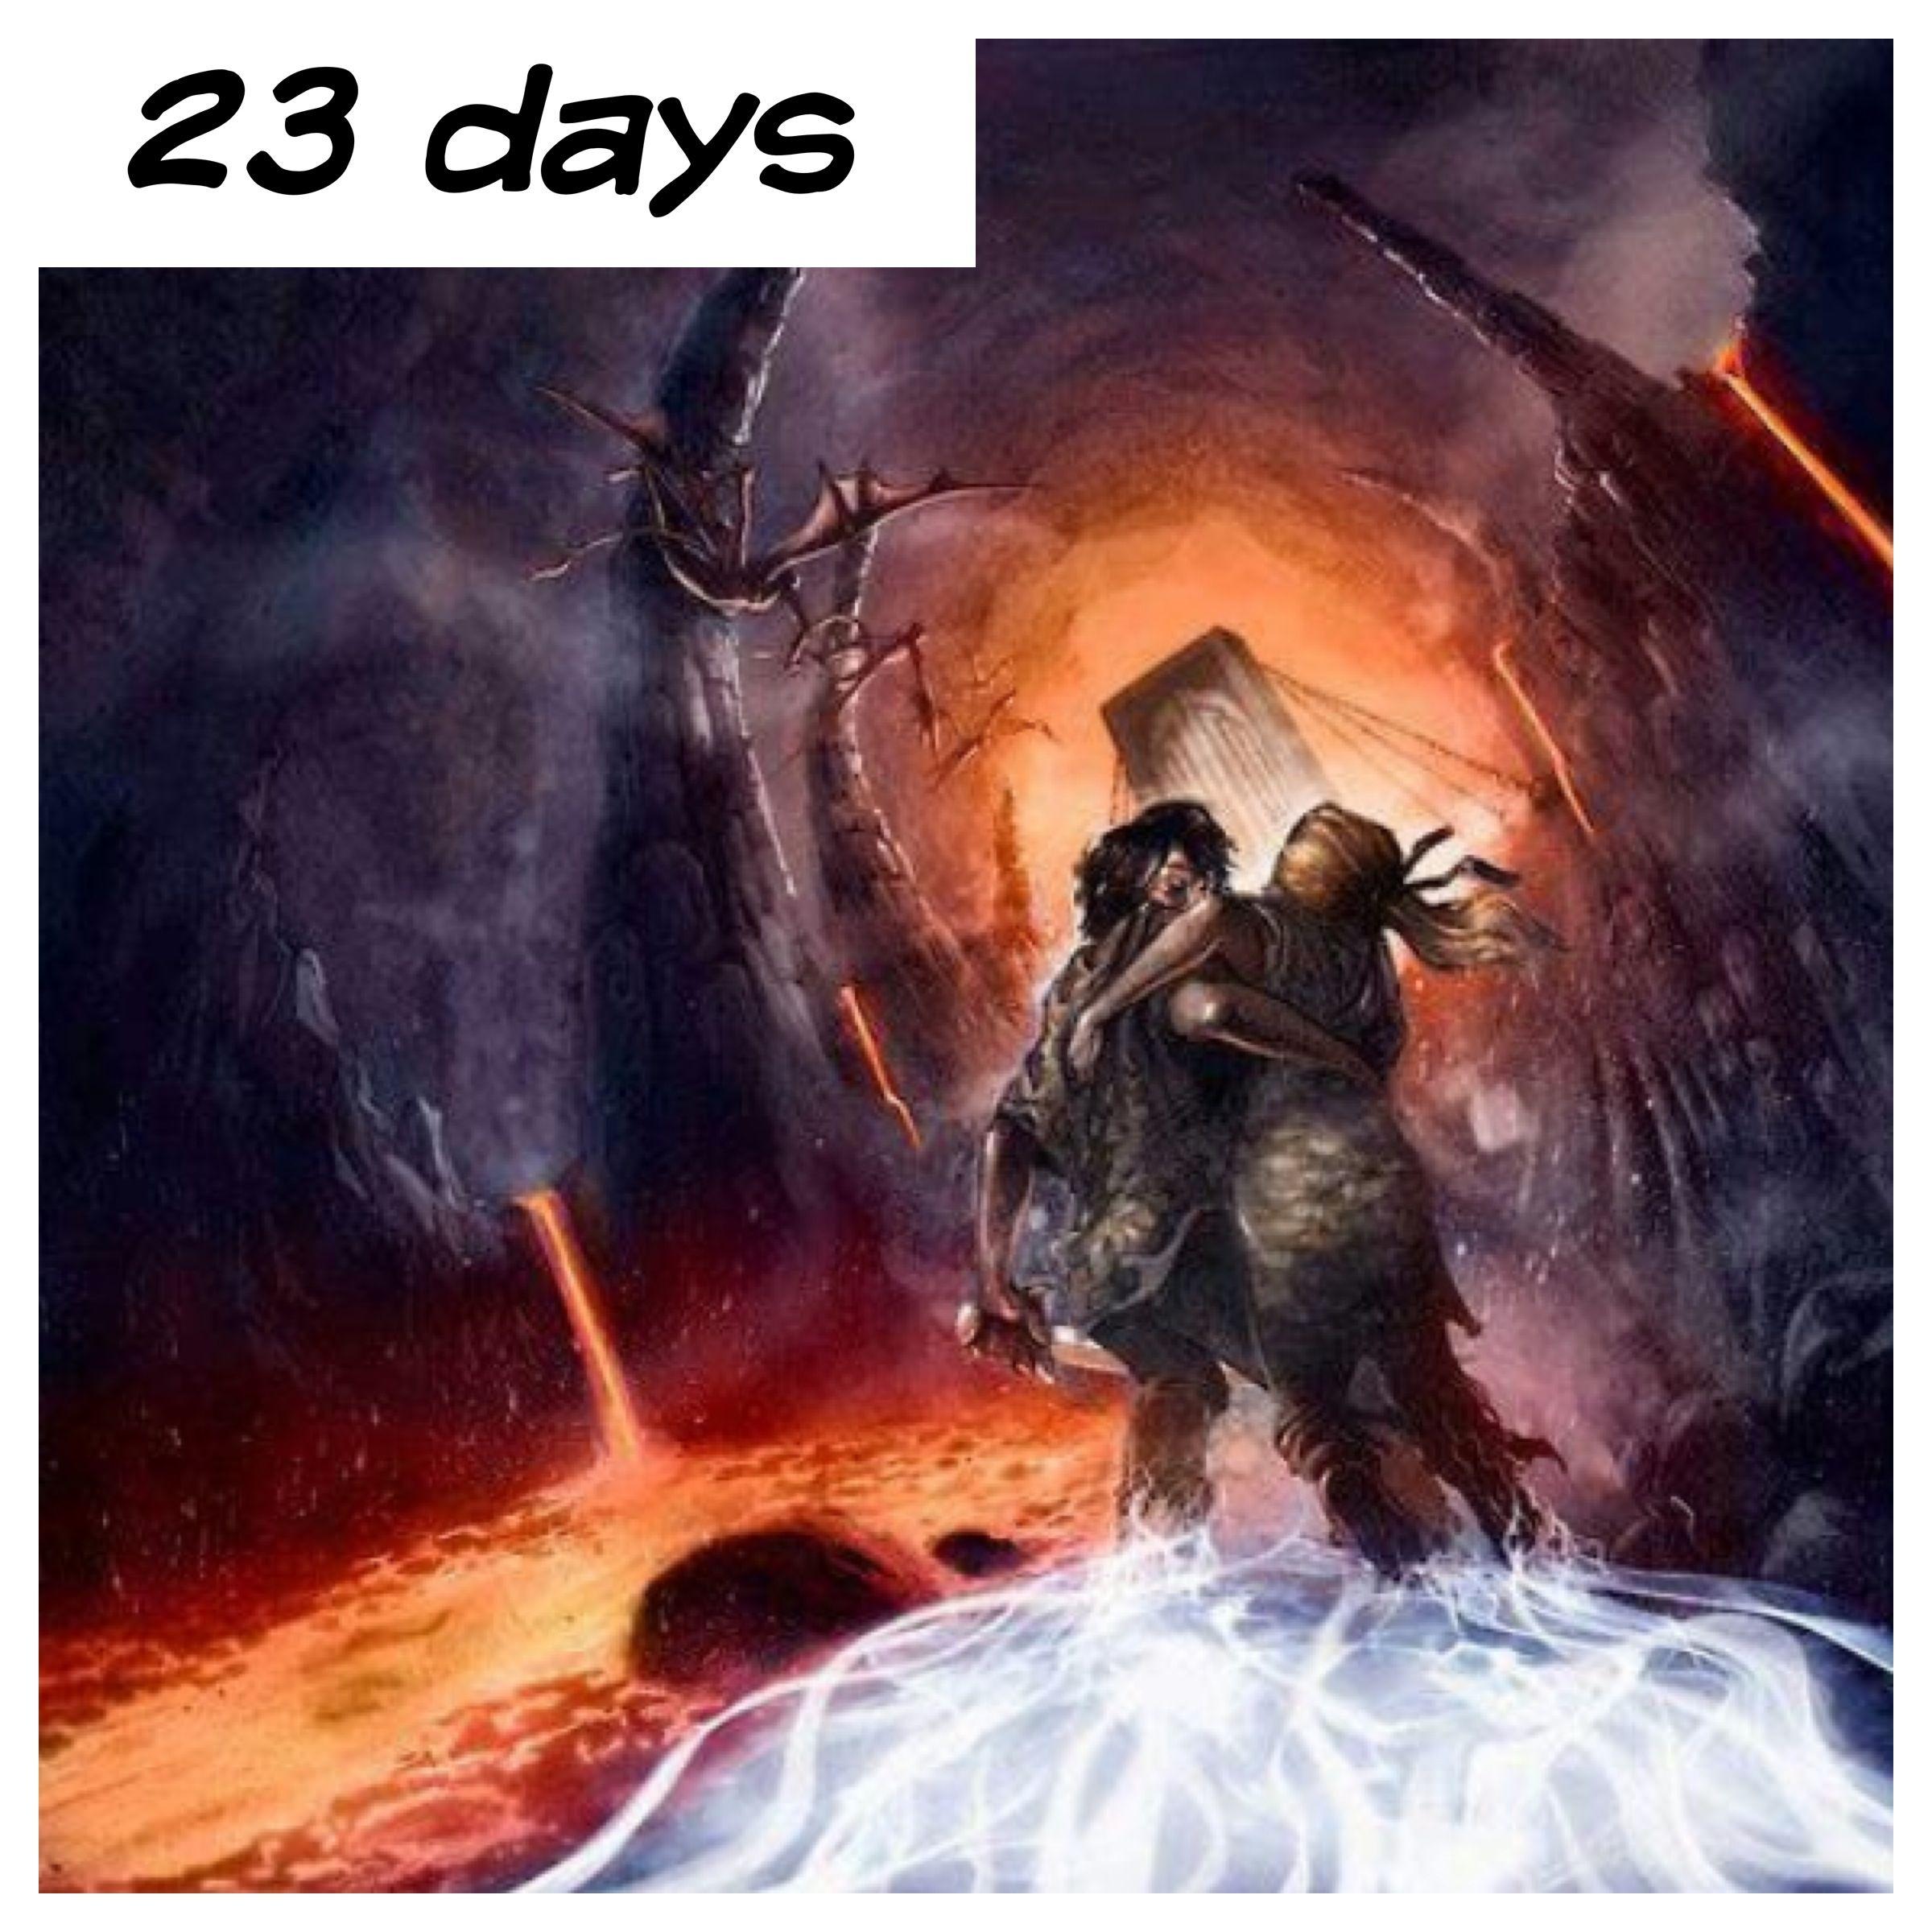 23 days it's sunday